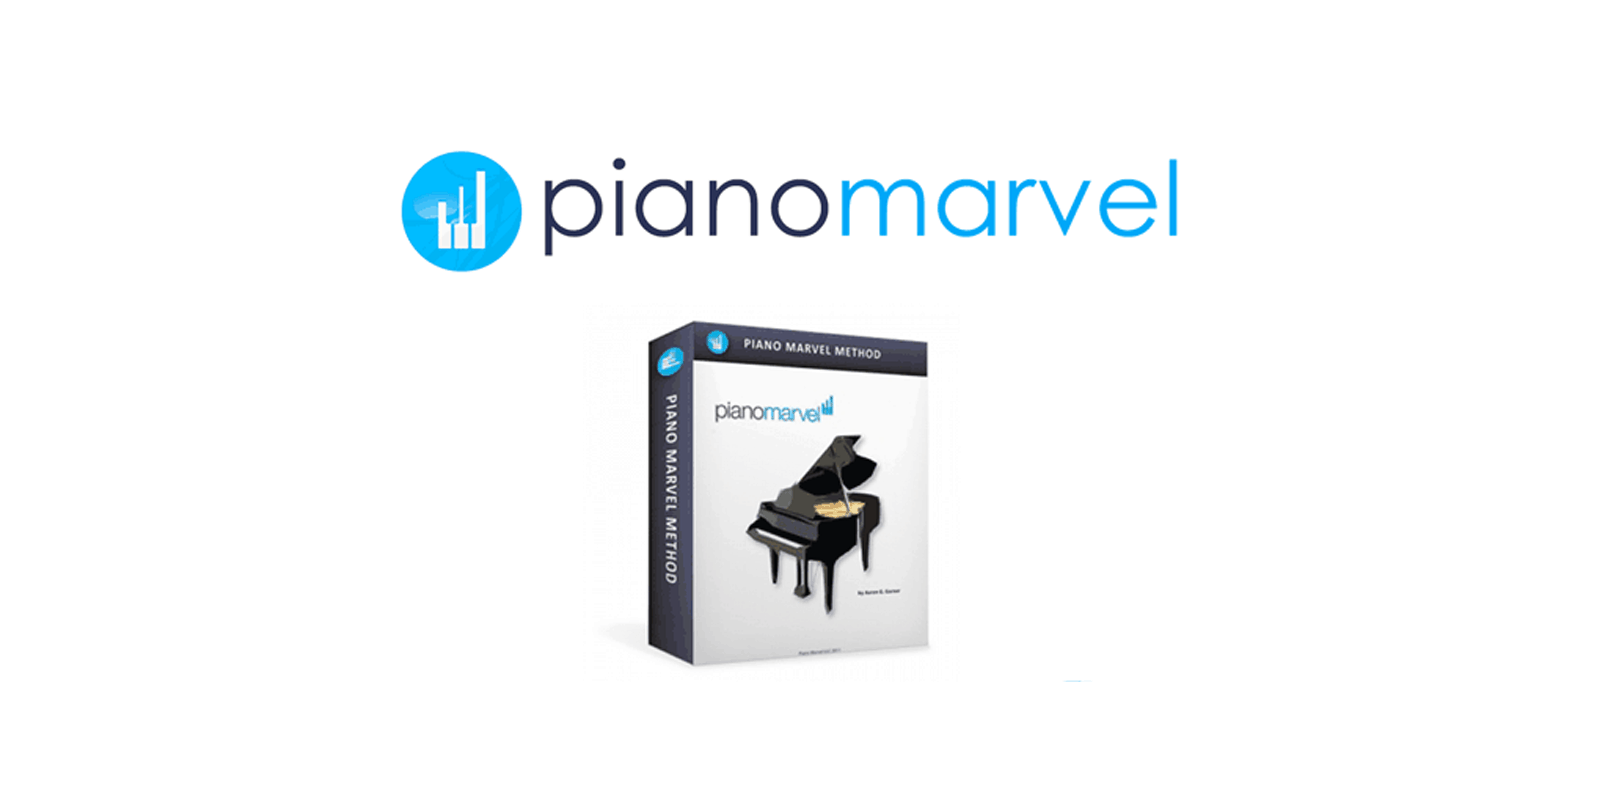 Piano Marvel reviews